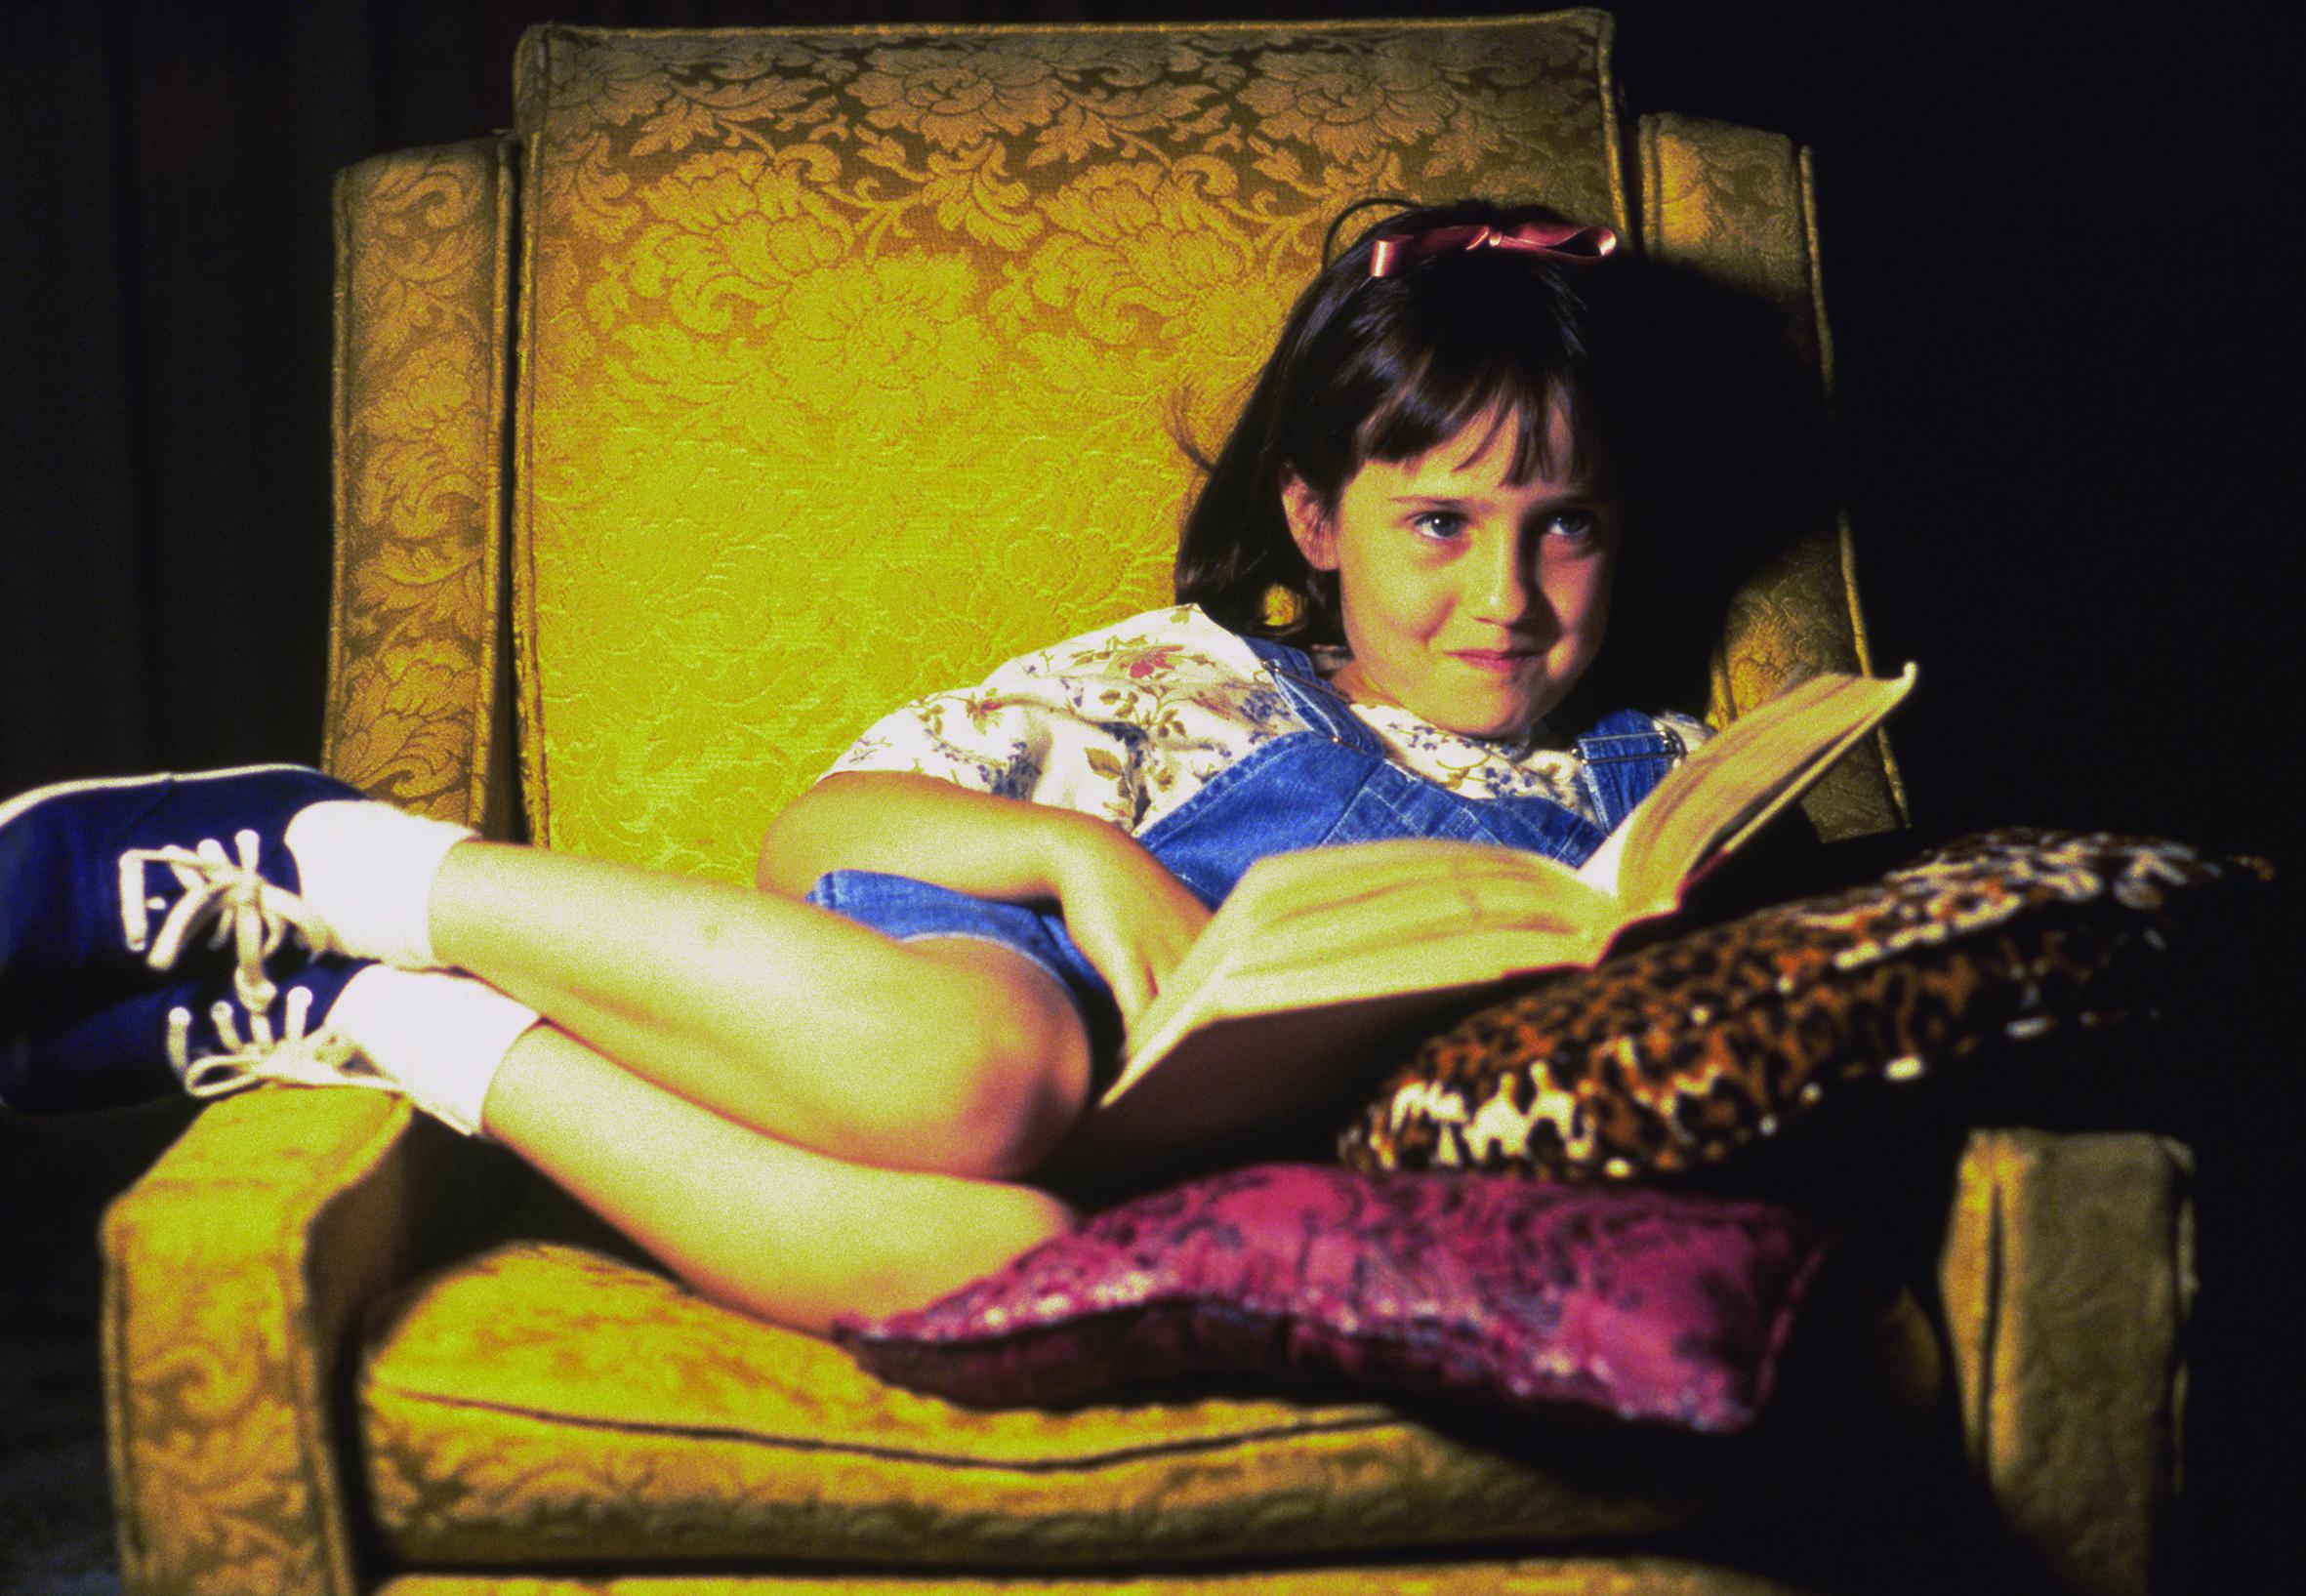 The best kids' movies on Netflix